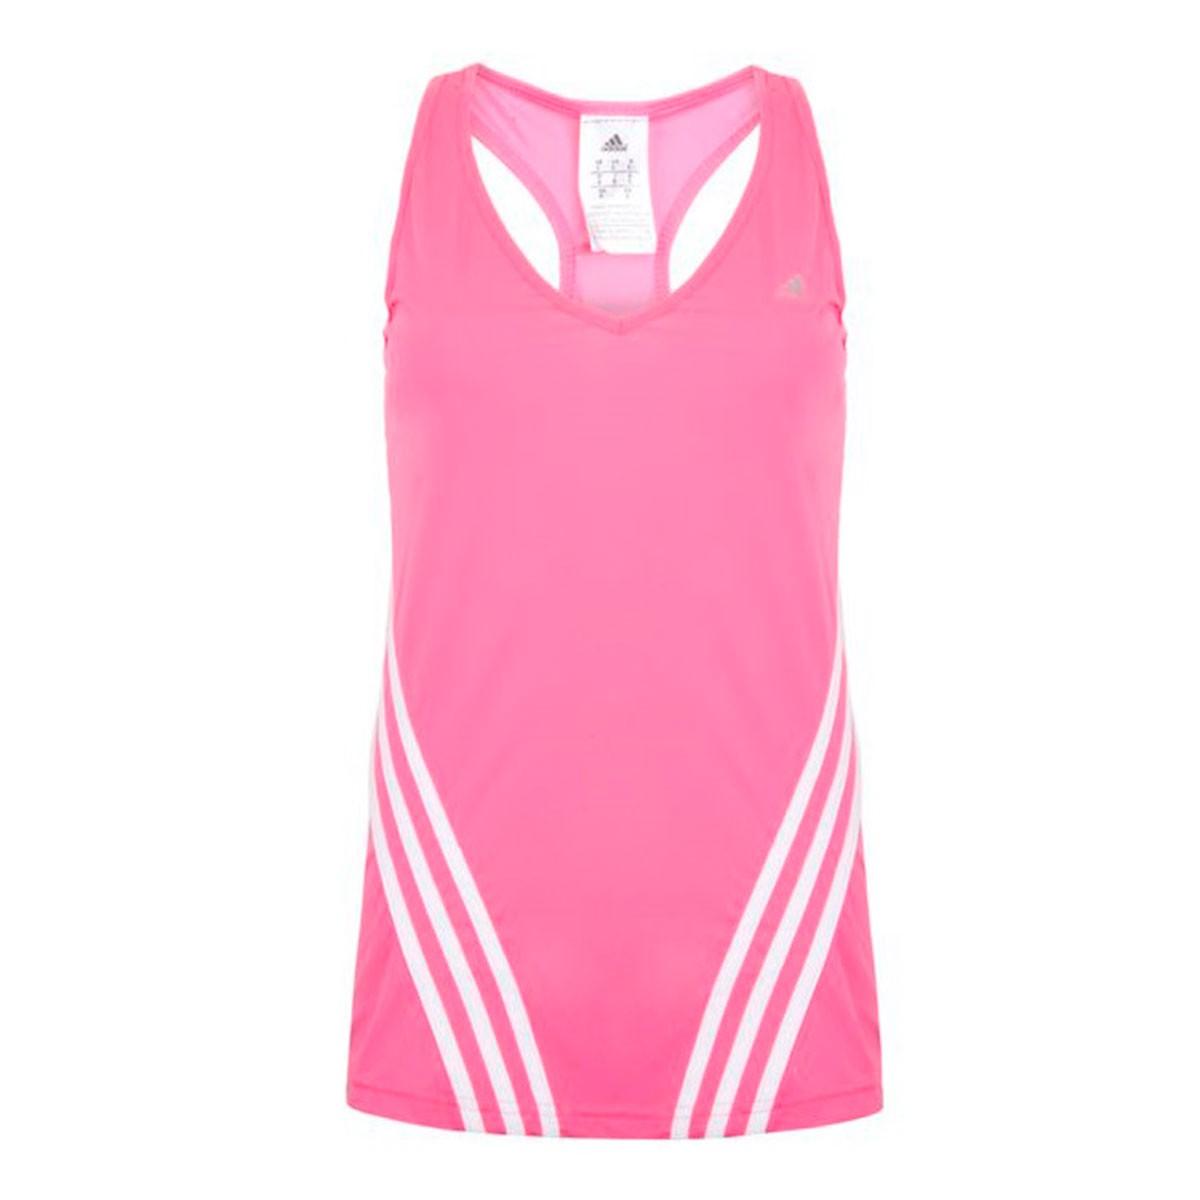 Camiseta Regata Adidas MF LW Tank 3S Rosa